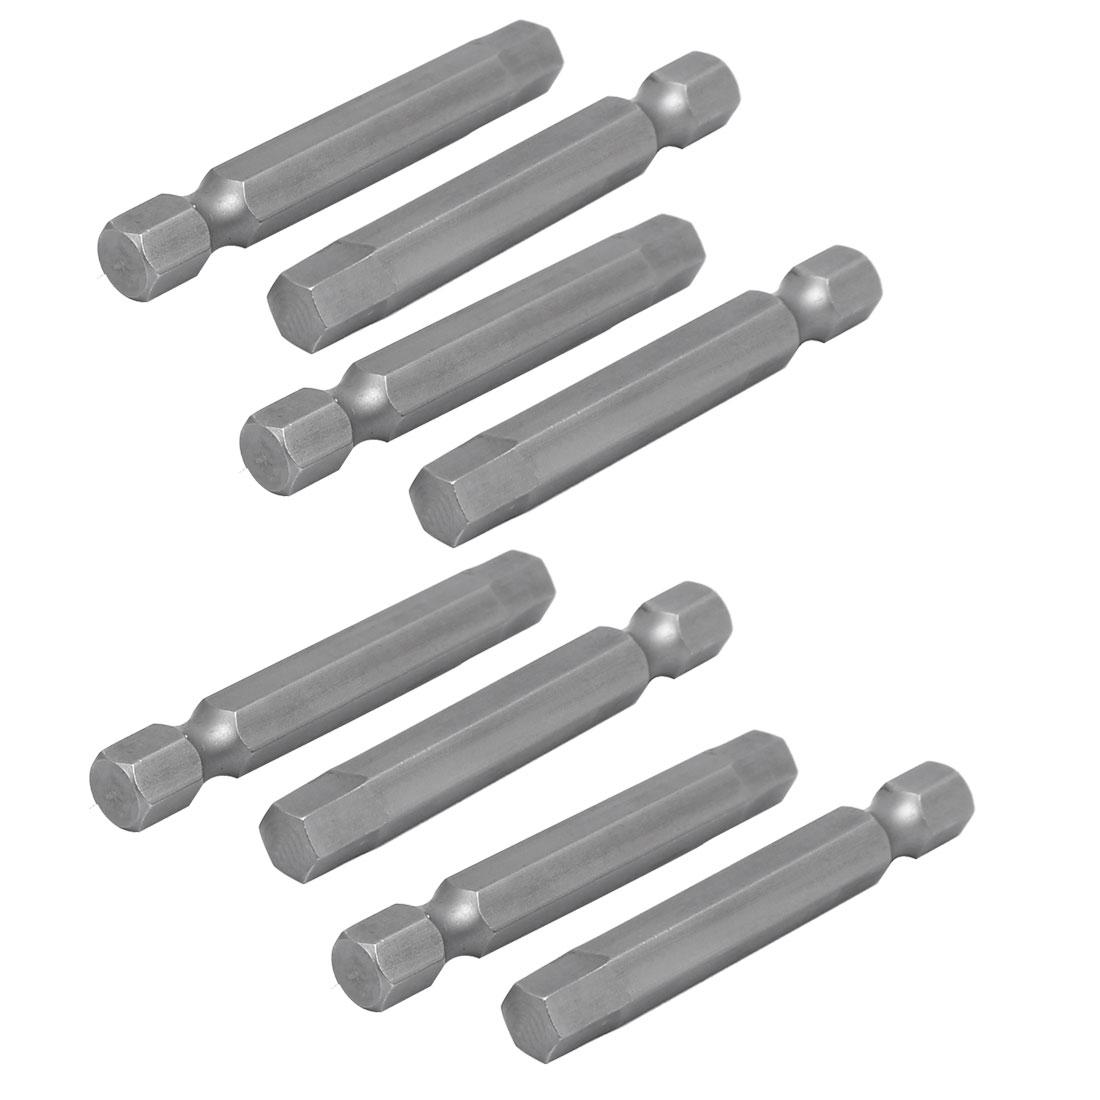 6mm Hex Shank 60mm Length 6mm Hexagon Tip Screwdriver Bits Repair Tool 8pcs